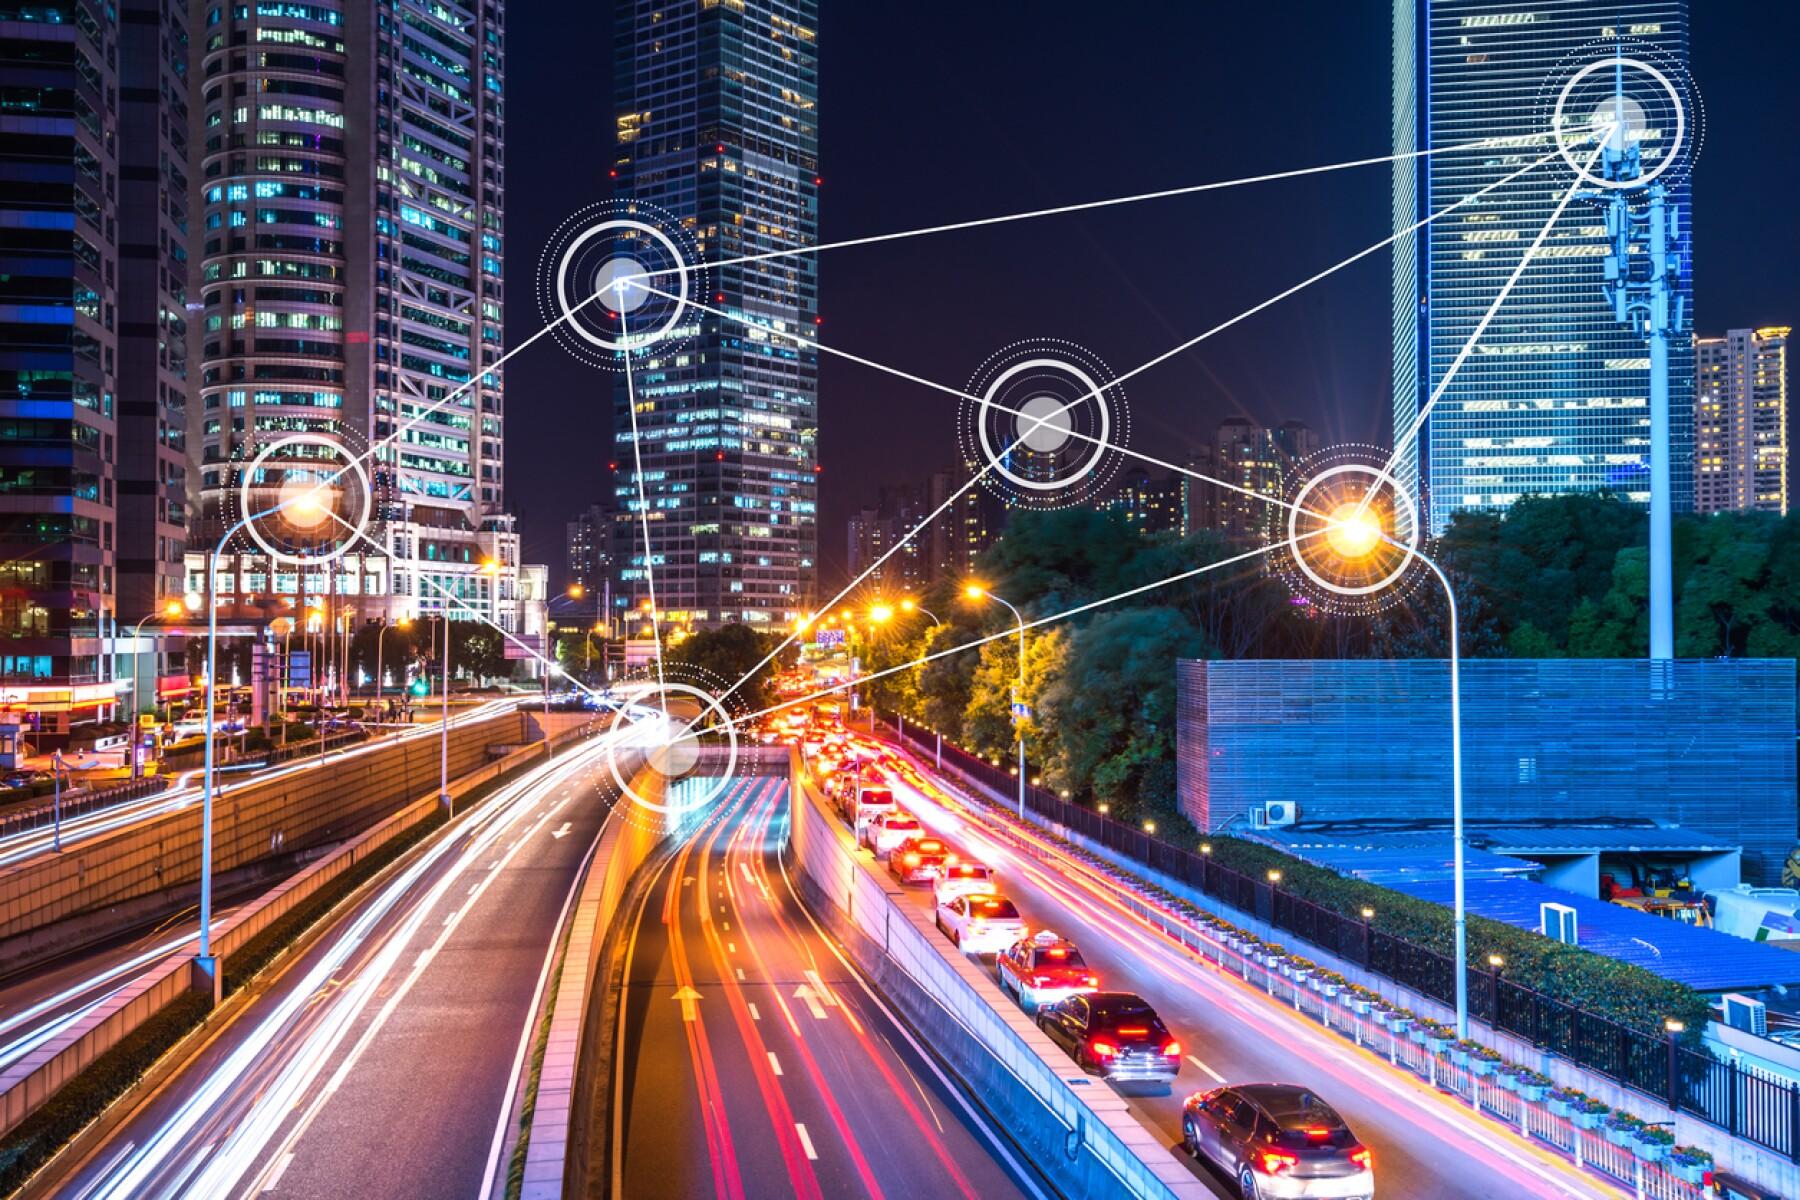 edificio inteligente - cibercrimen - ciberataque - inteligencia artificial - hipercontectividad